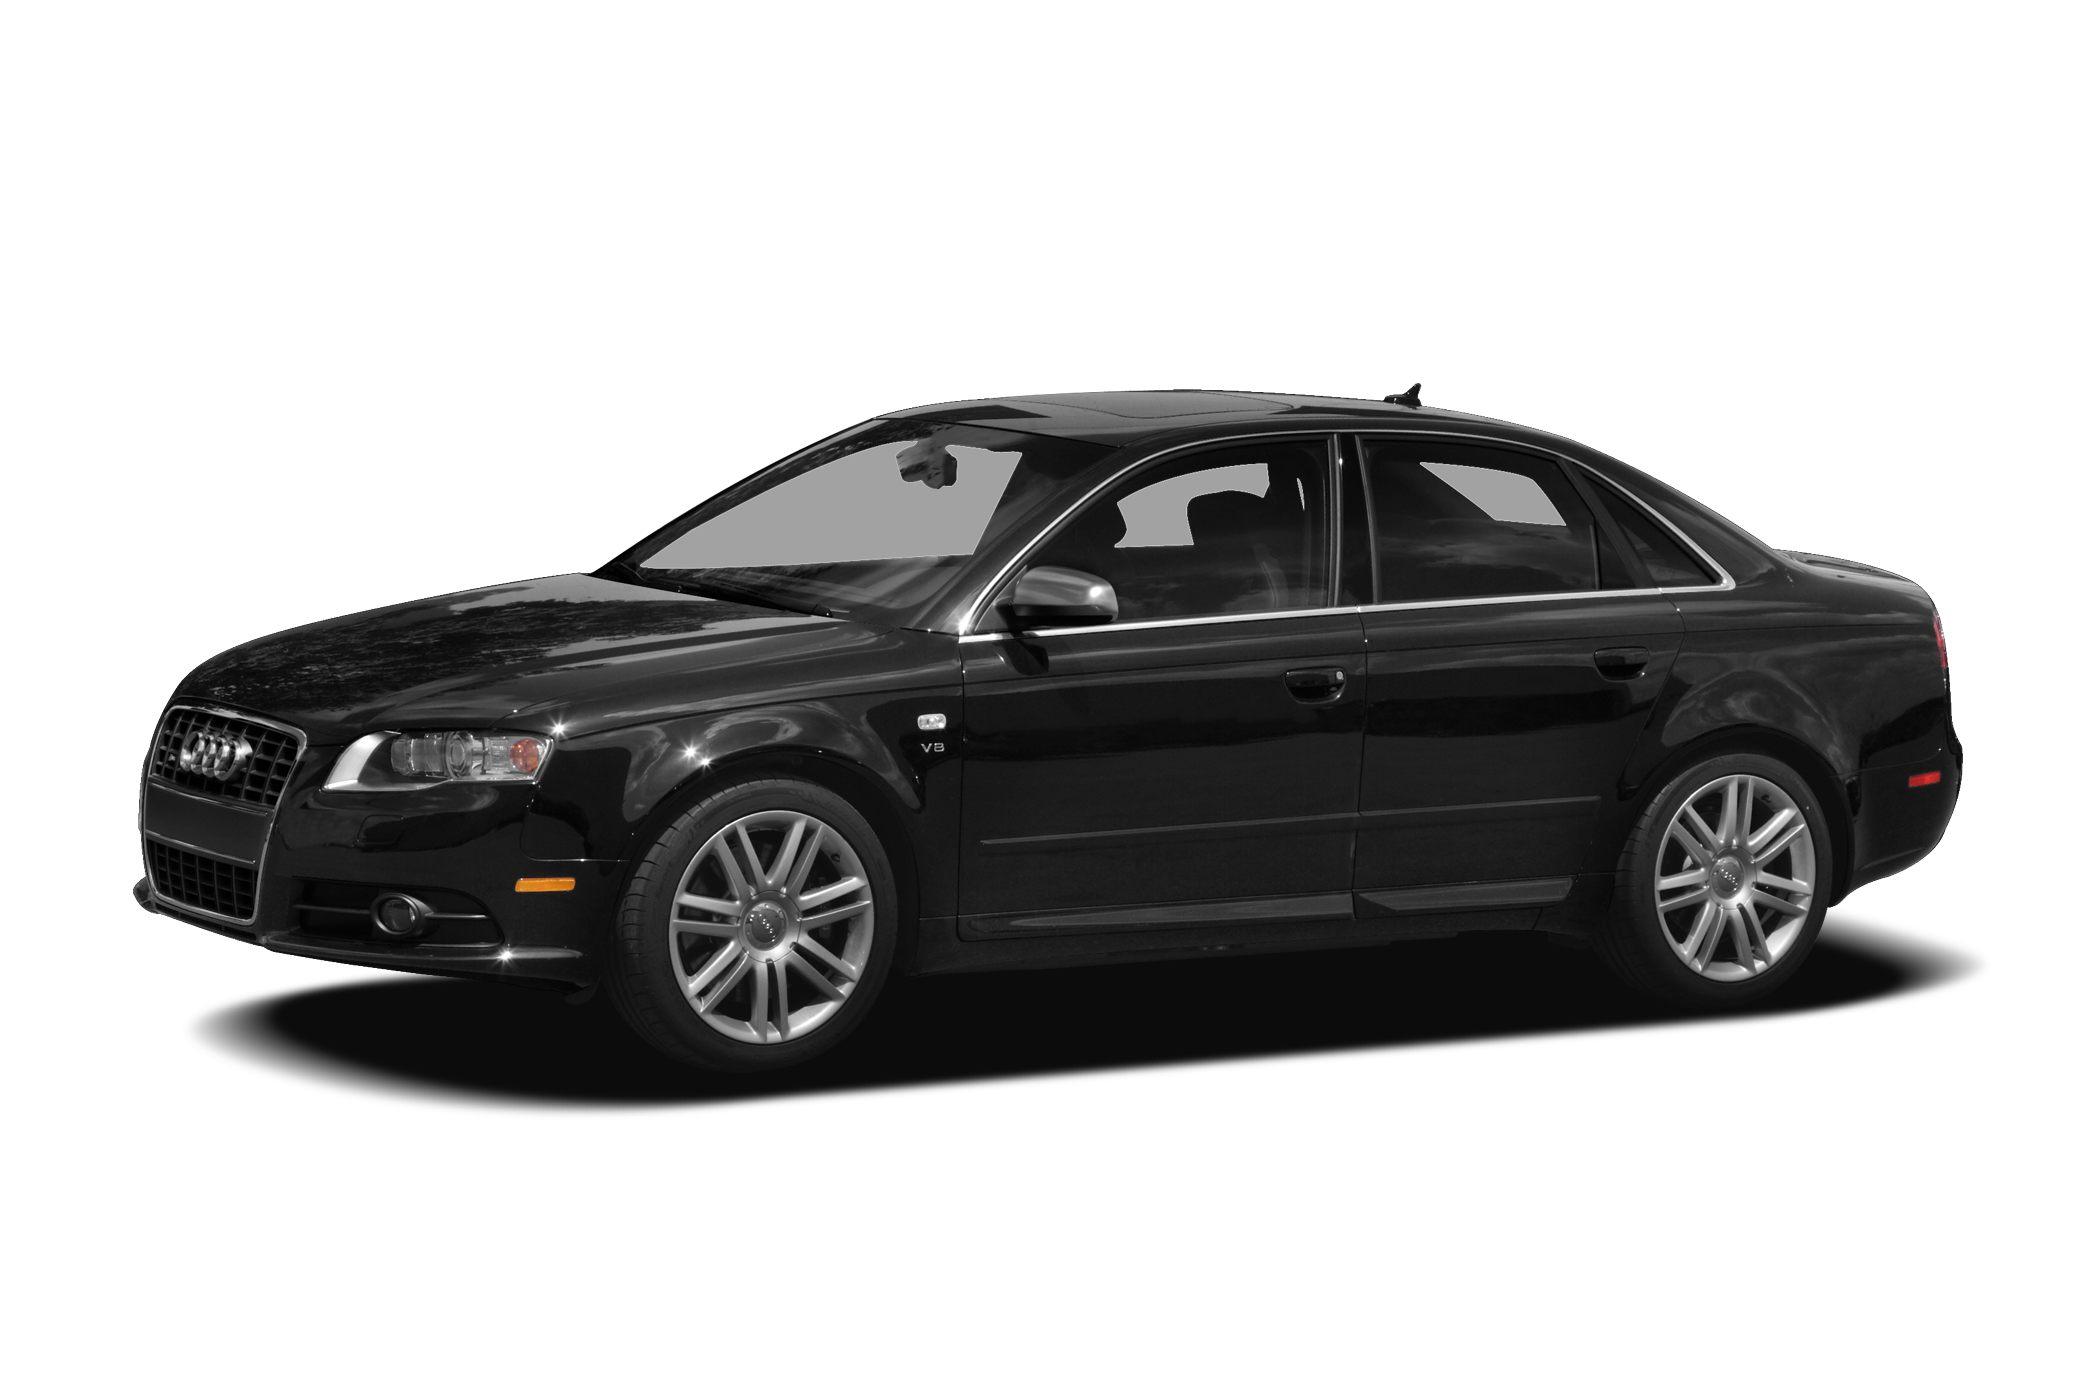 Kelebihan Audi S4 2007 Murah Berkualitas